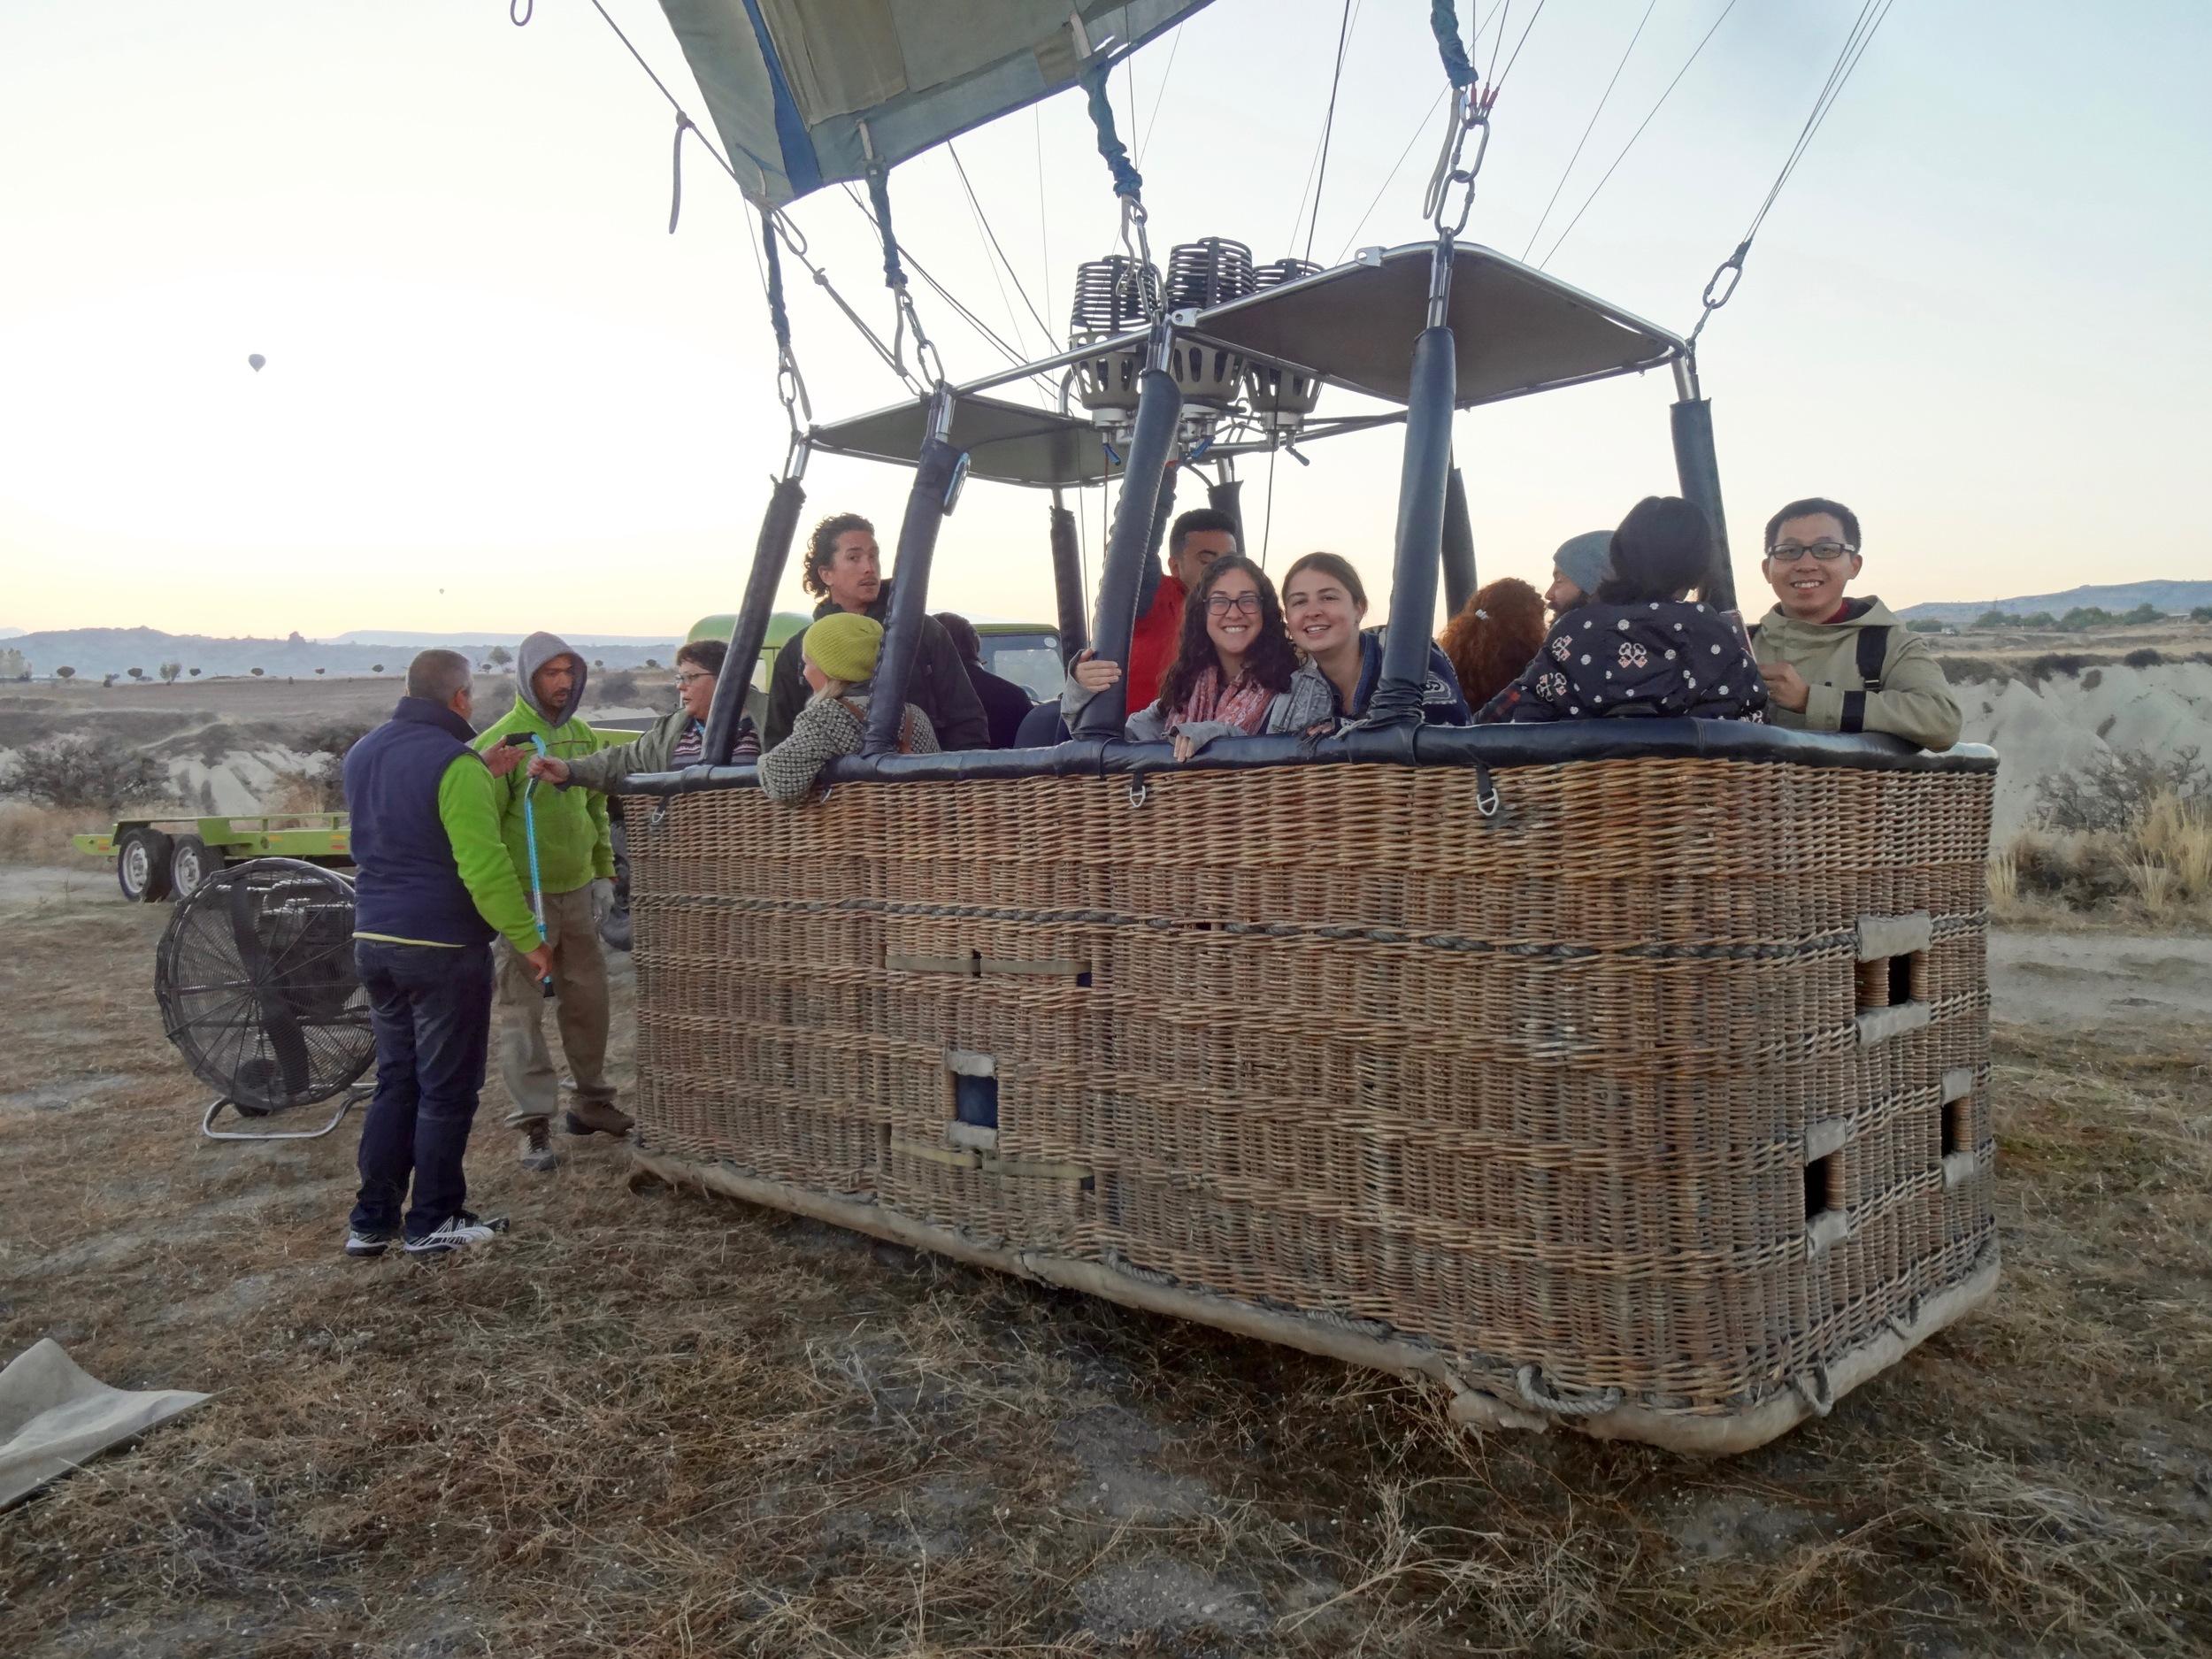 we were very smart to budget this splurge... hot air BALLOONING in cappadocia, turkey